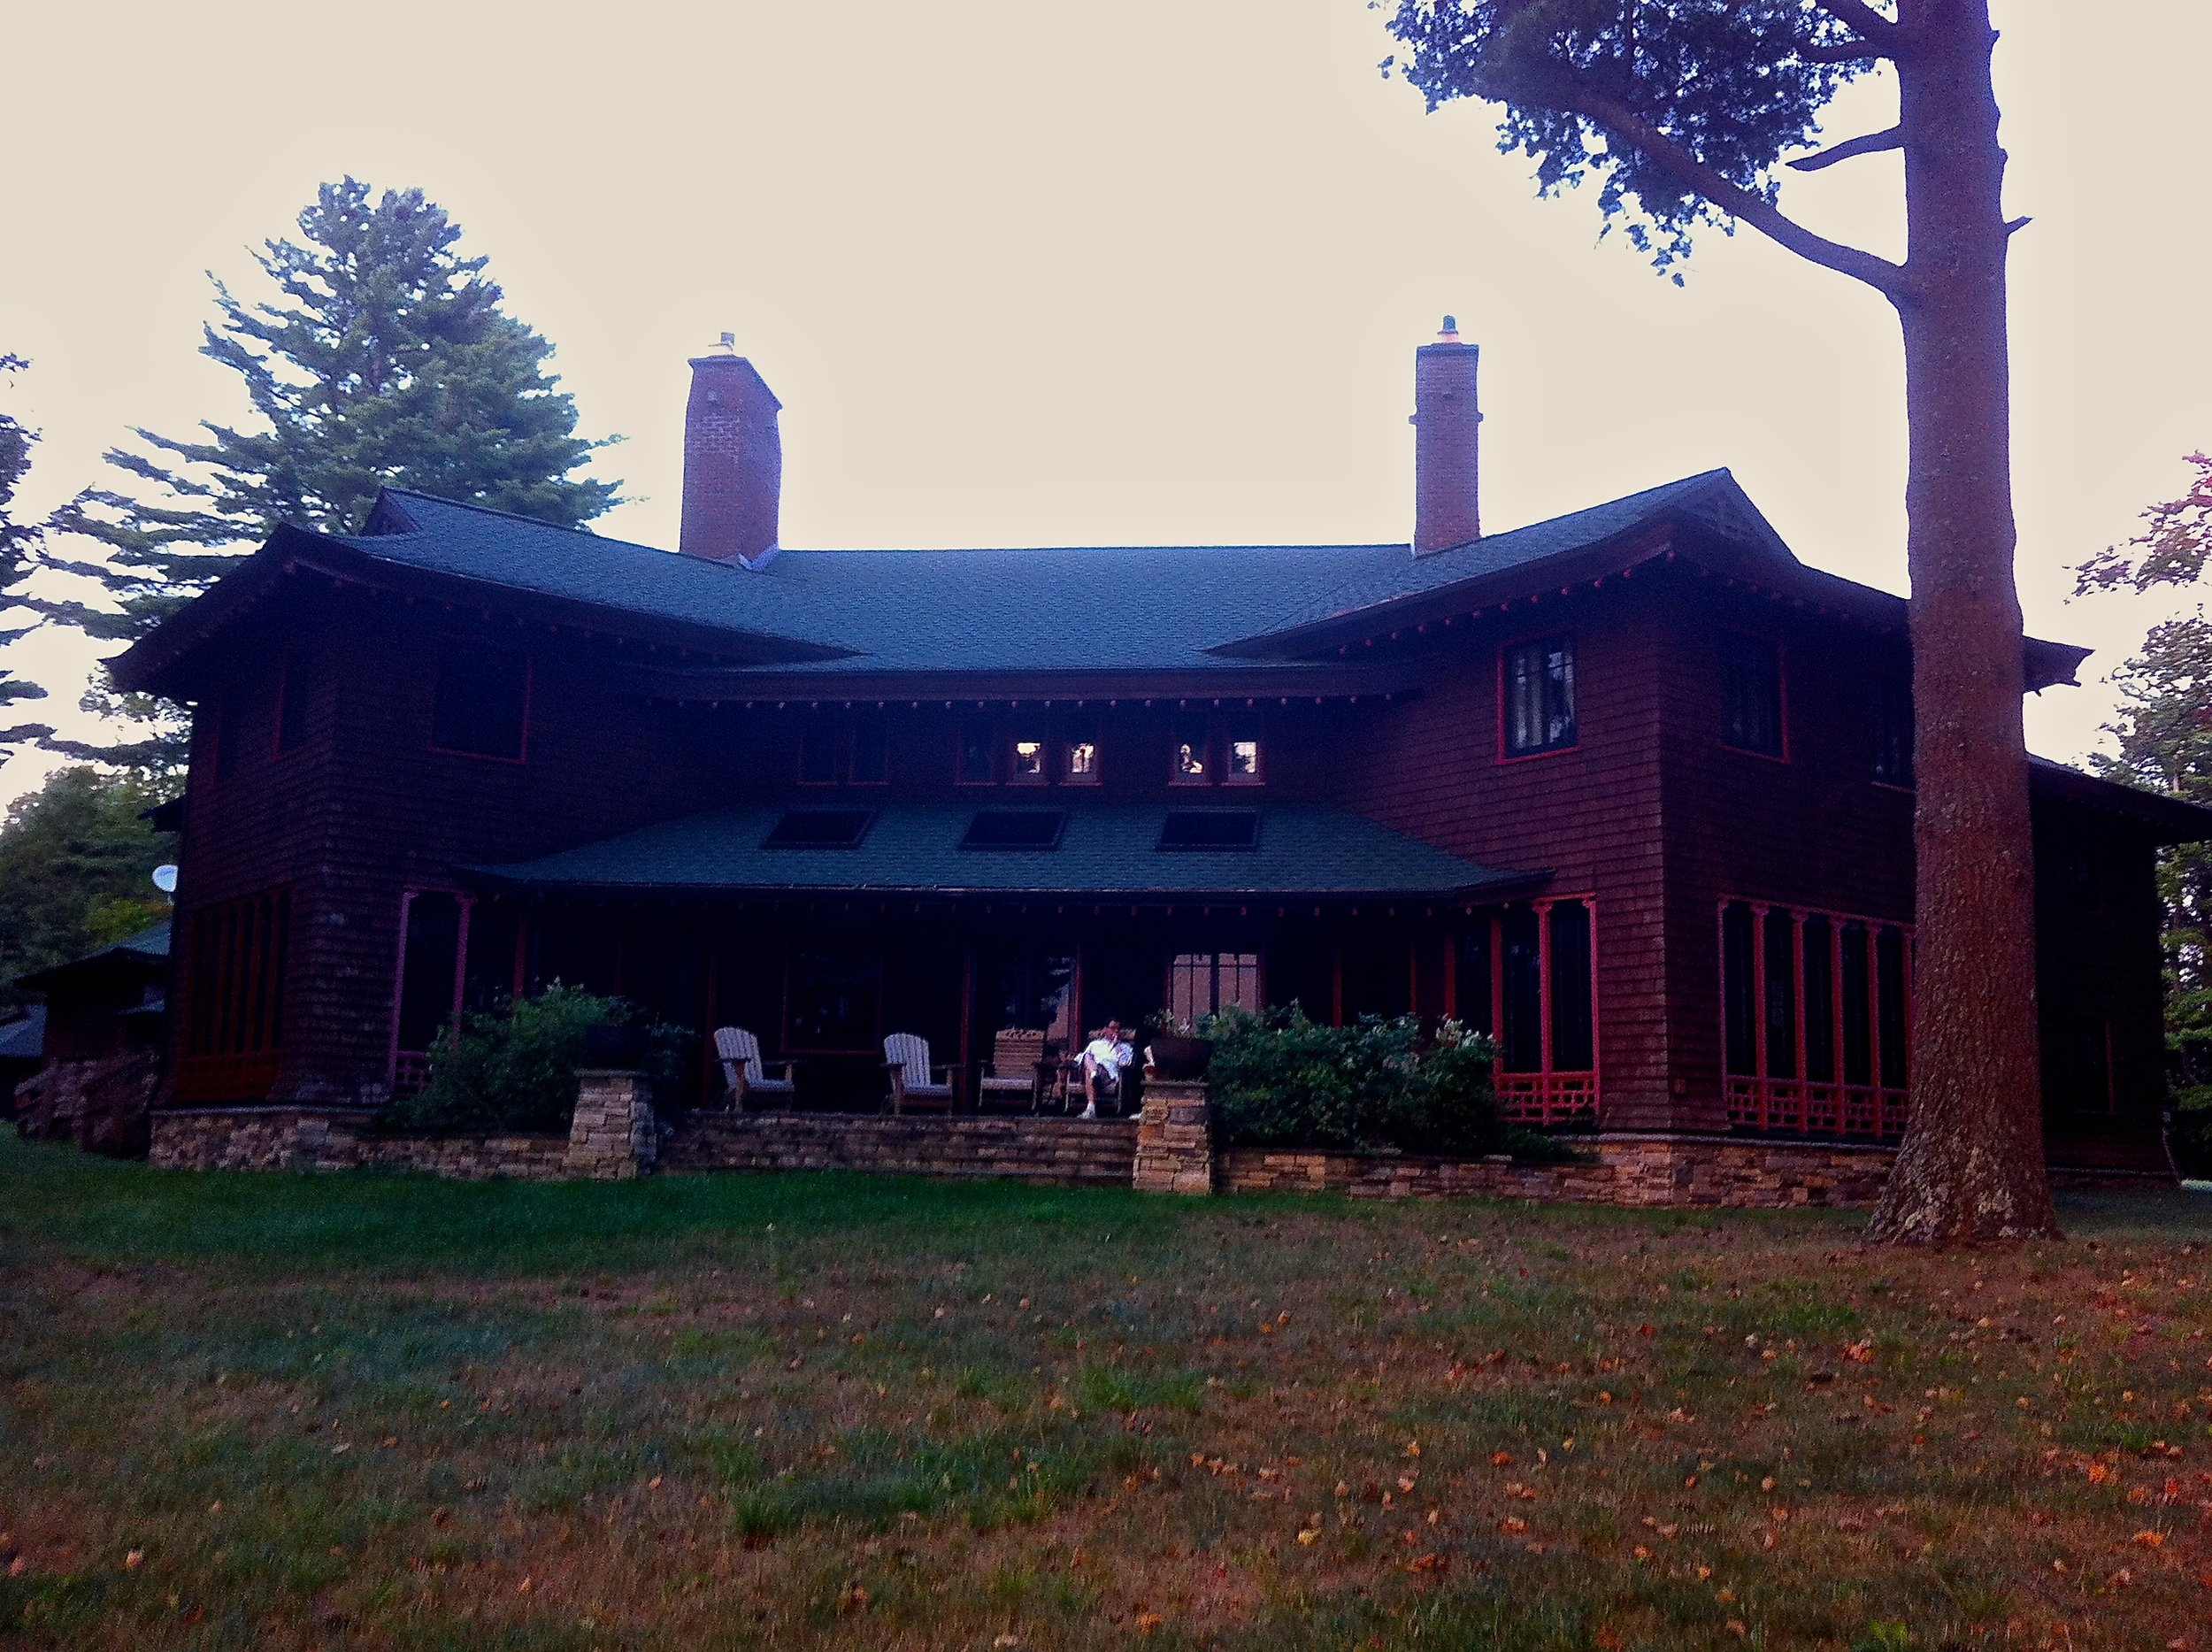 President Harrison's Lakehouse from 2nd Lake, Photo Credit: David W. Weygandt